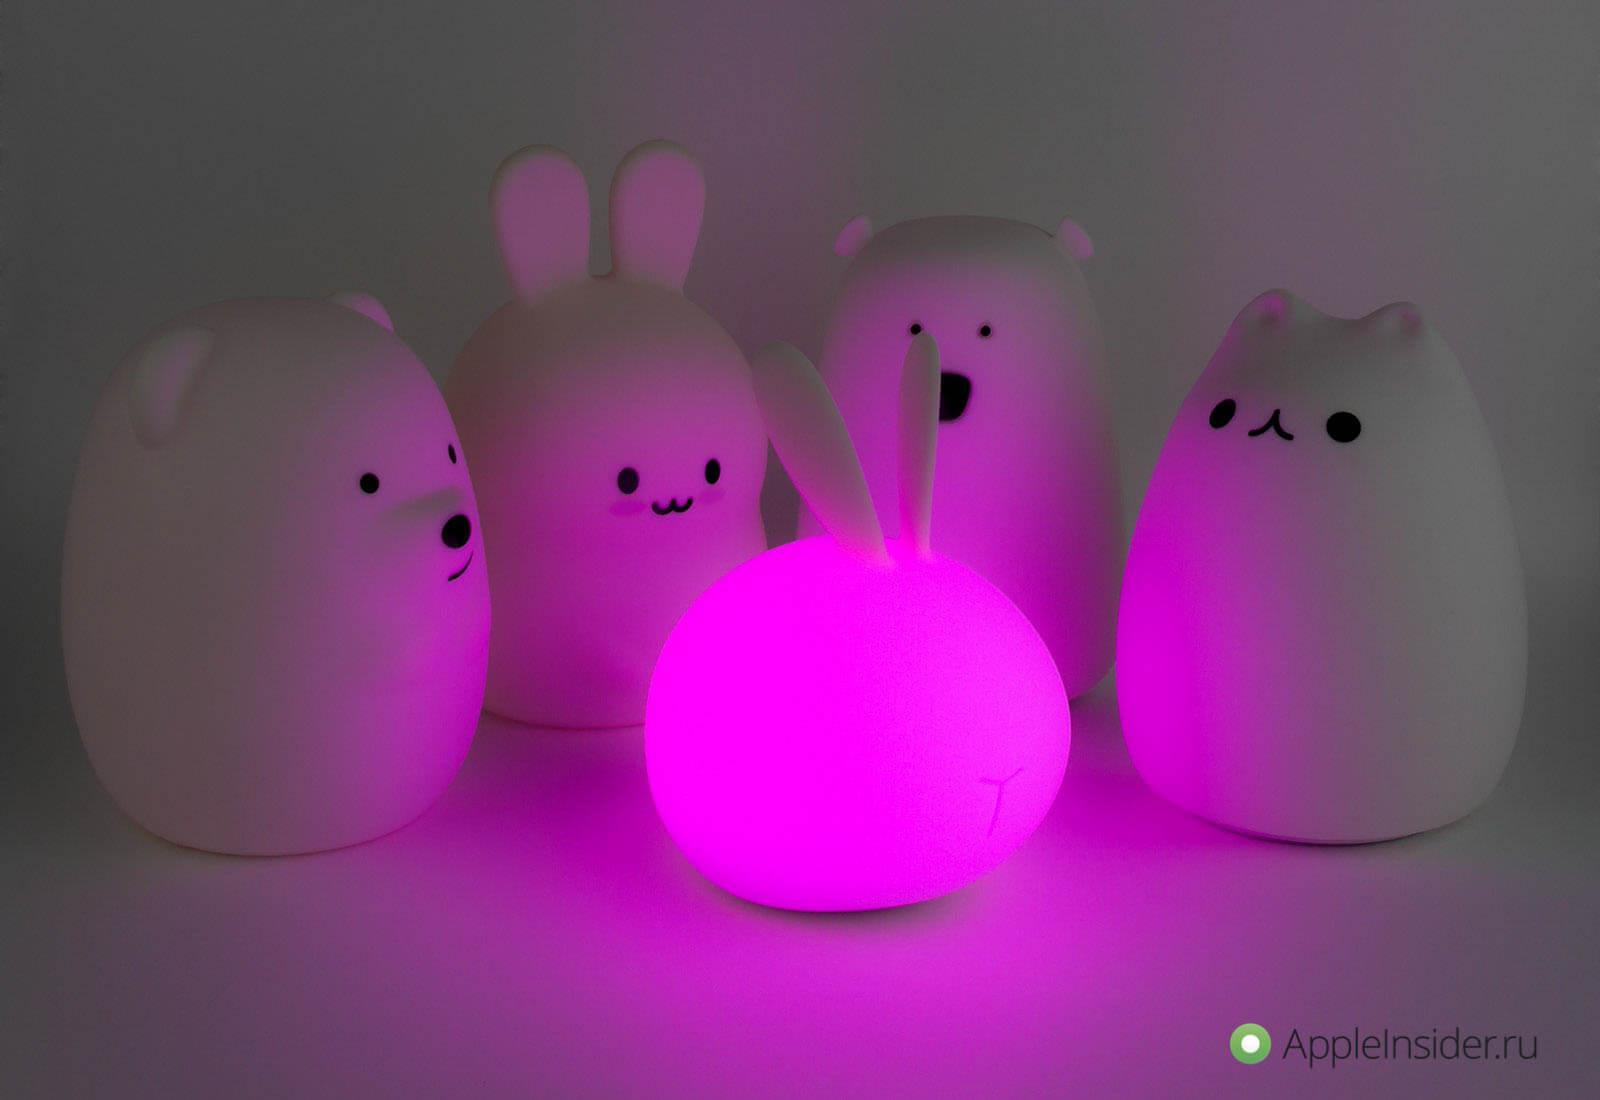 Rombica LED Ricky — ночник, который могла бы сделать Apple